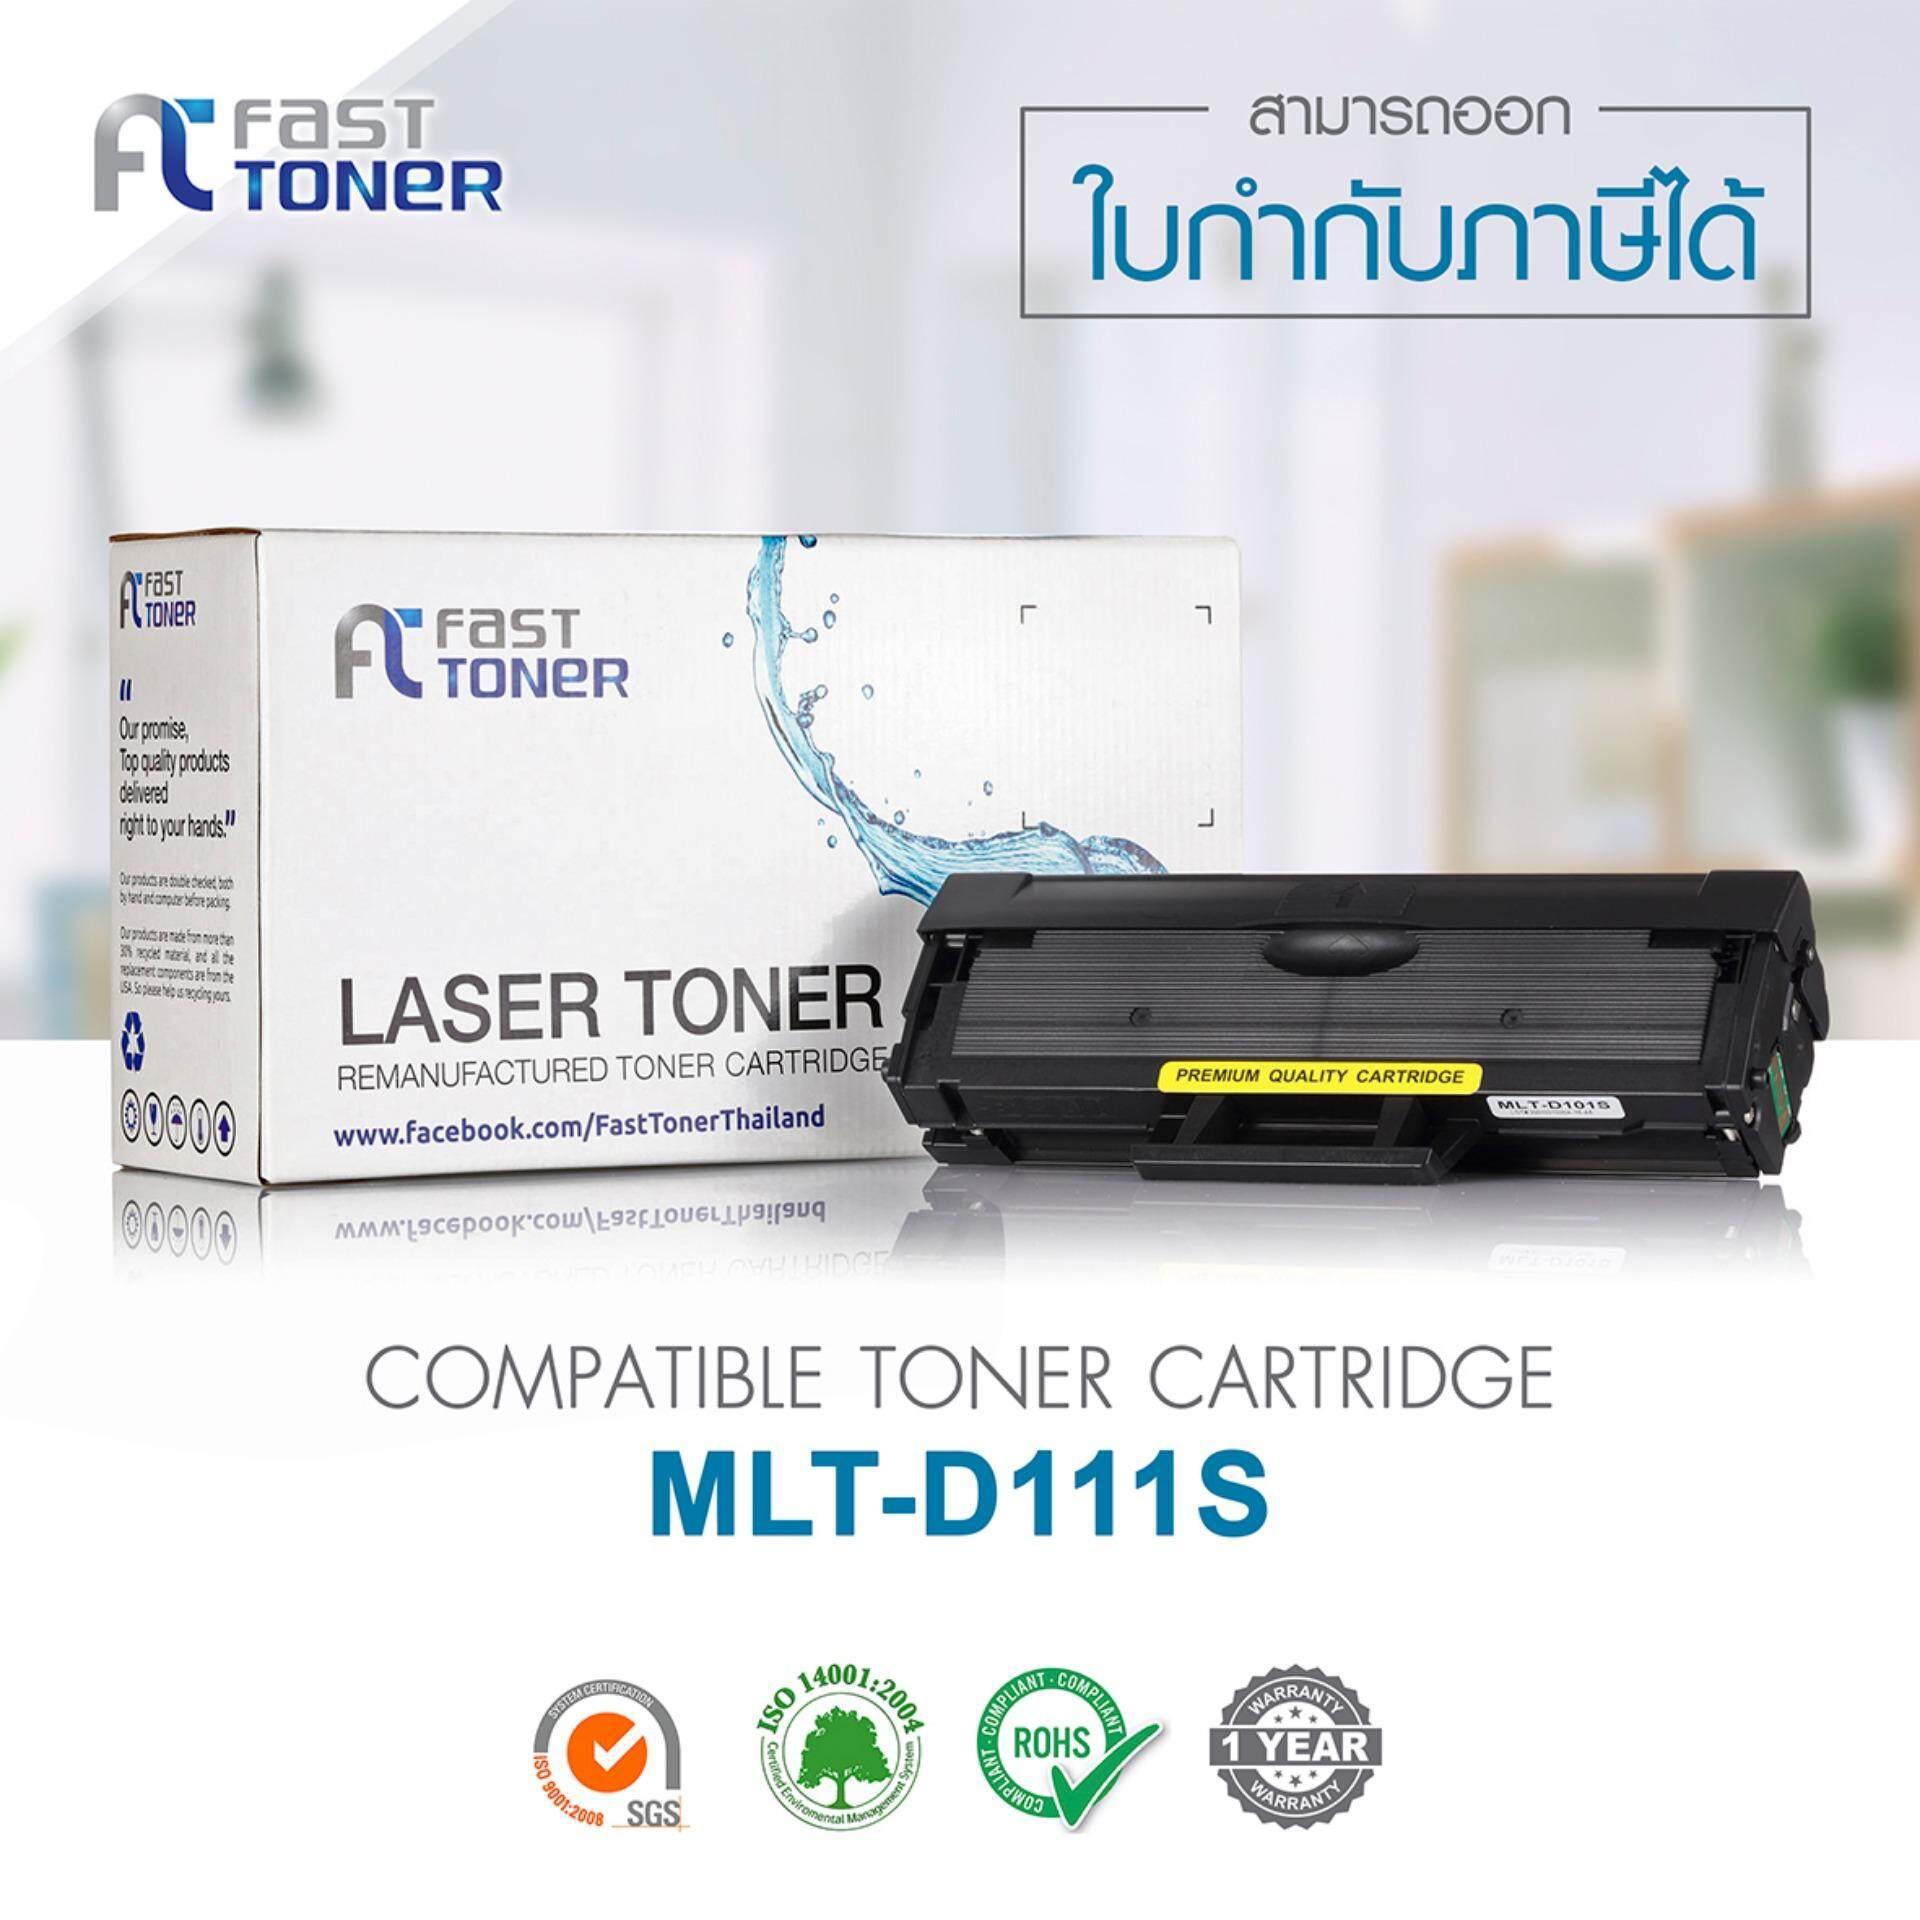 Fast Toner หมึกพิมพ์เลเซอร์ Samsung รุ่น MLT-D111S สำหรับปริ้นเตอร์รุ่น - Samsung SL-M2020/SL-202/SL-M2070/SL-M2070/SL-M2070F/SL-M2070FW/SL-M2070W